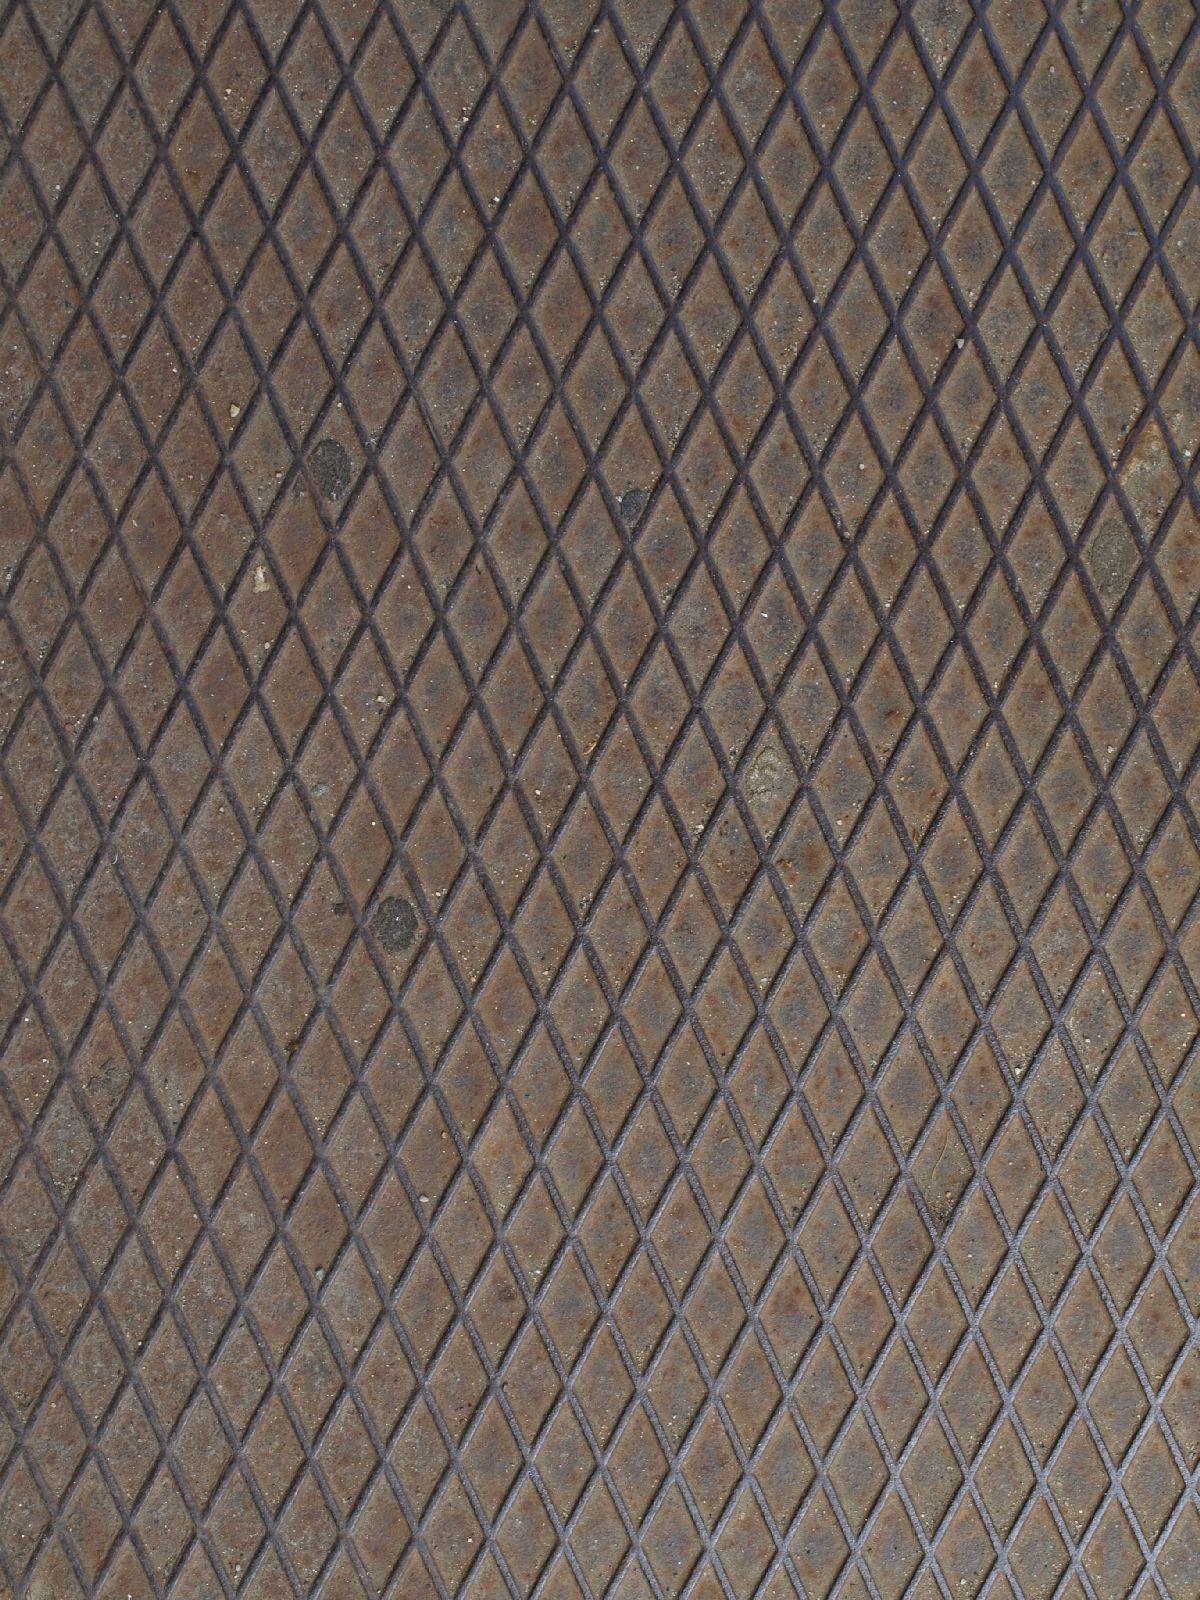 Metall_Textur_A_P4131055